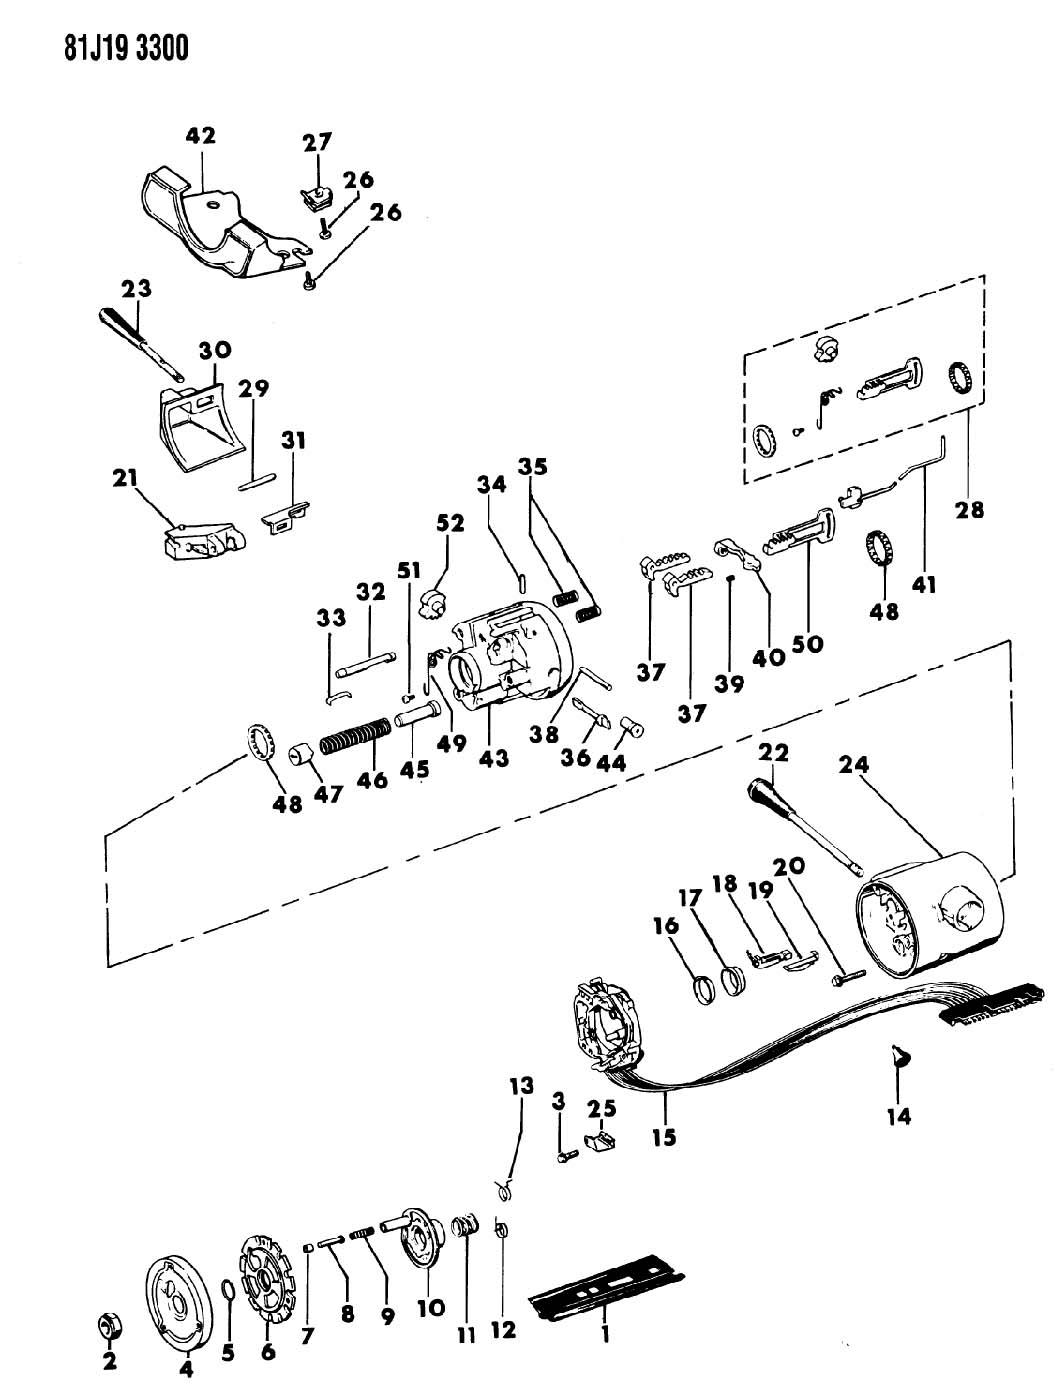 Jeep Housing Steering Column Upper With Floor Shift With Tilt Wheel Sj Wagoneer J10 J20